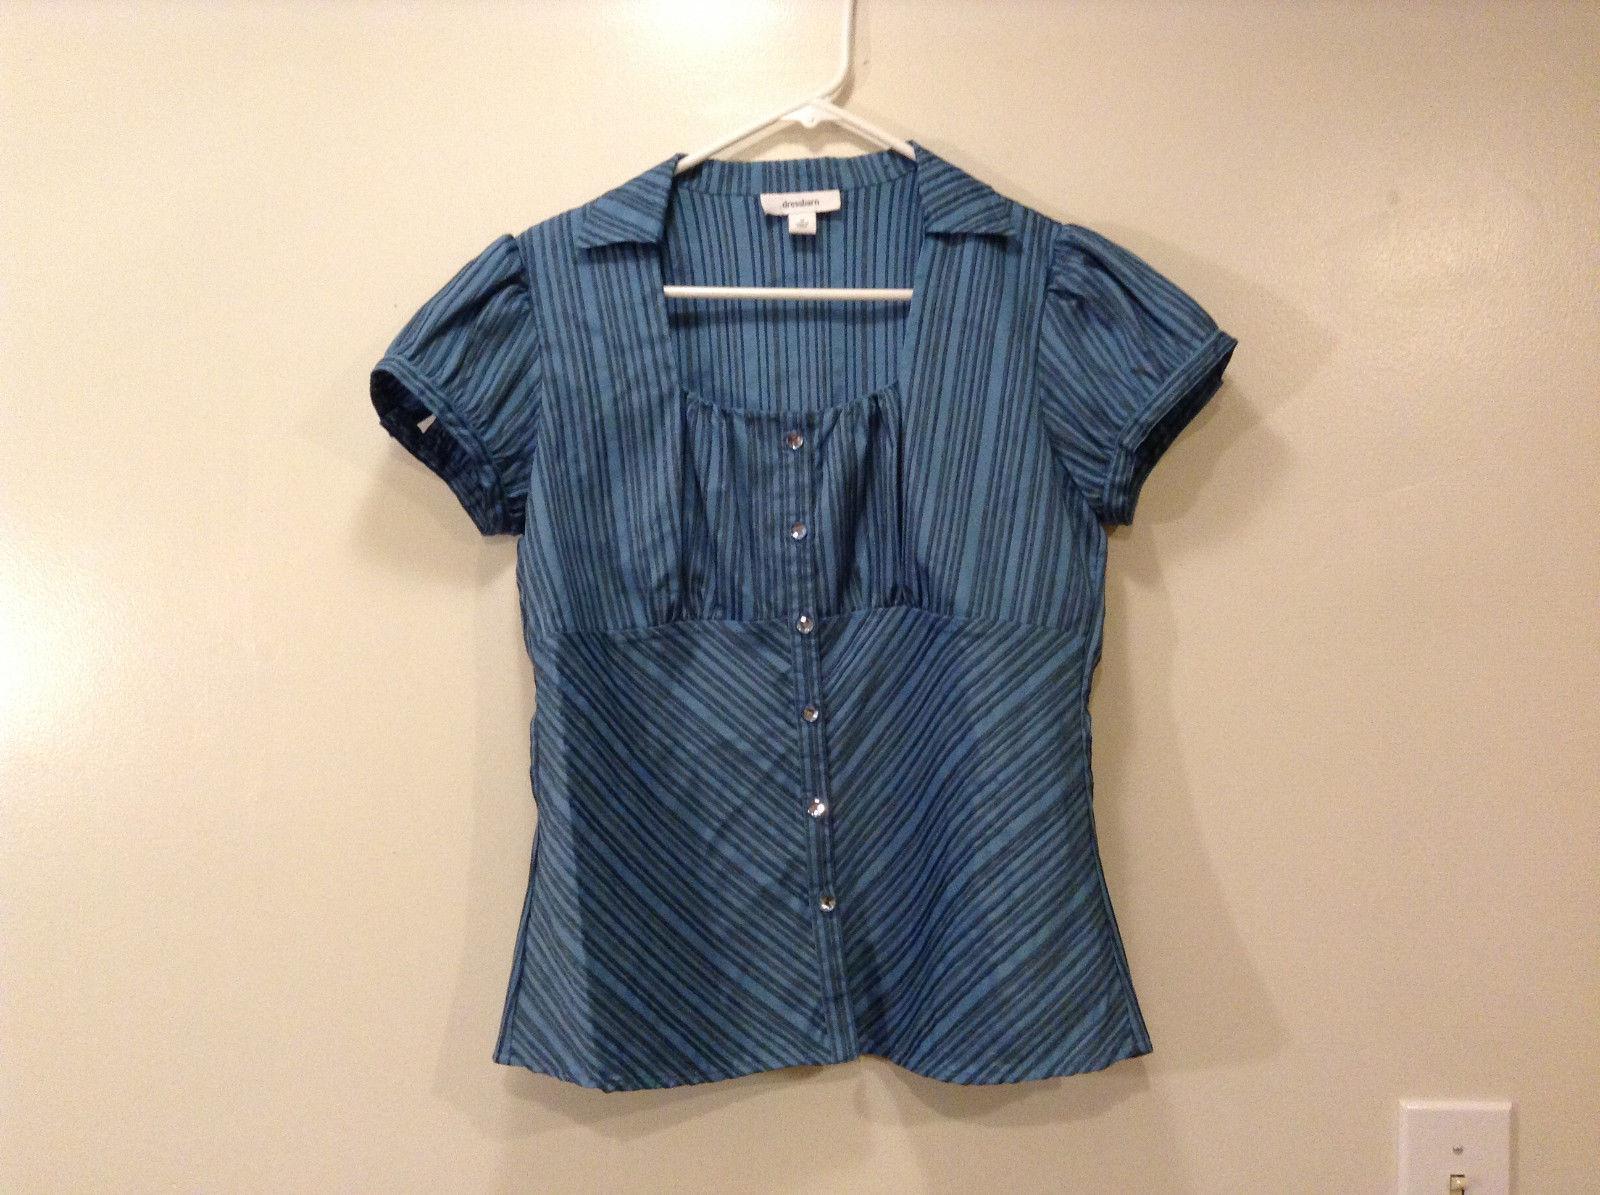 Dressbarn Ladies Blue Lt.Gray Striped Blouse Button Down Shirt, Size S